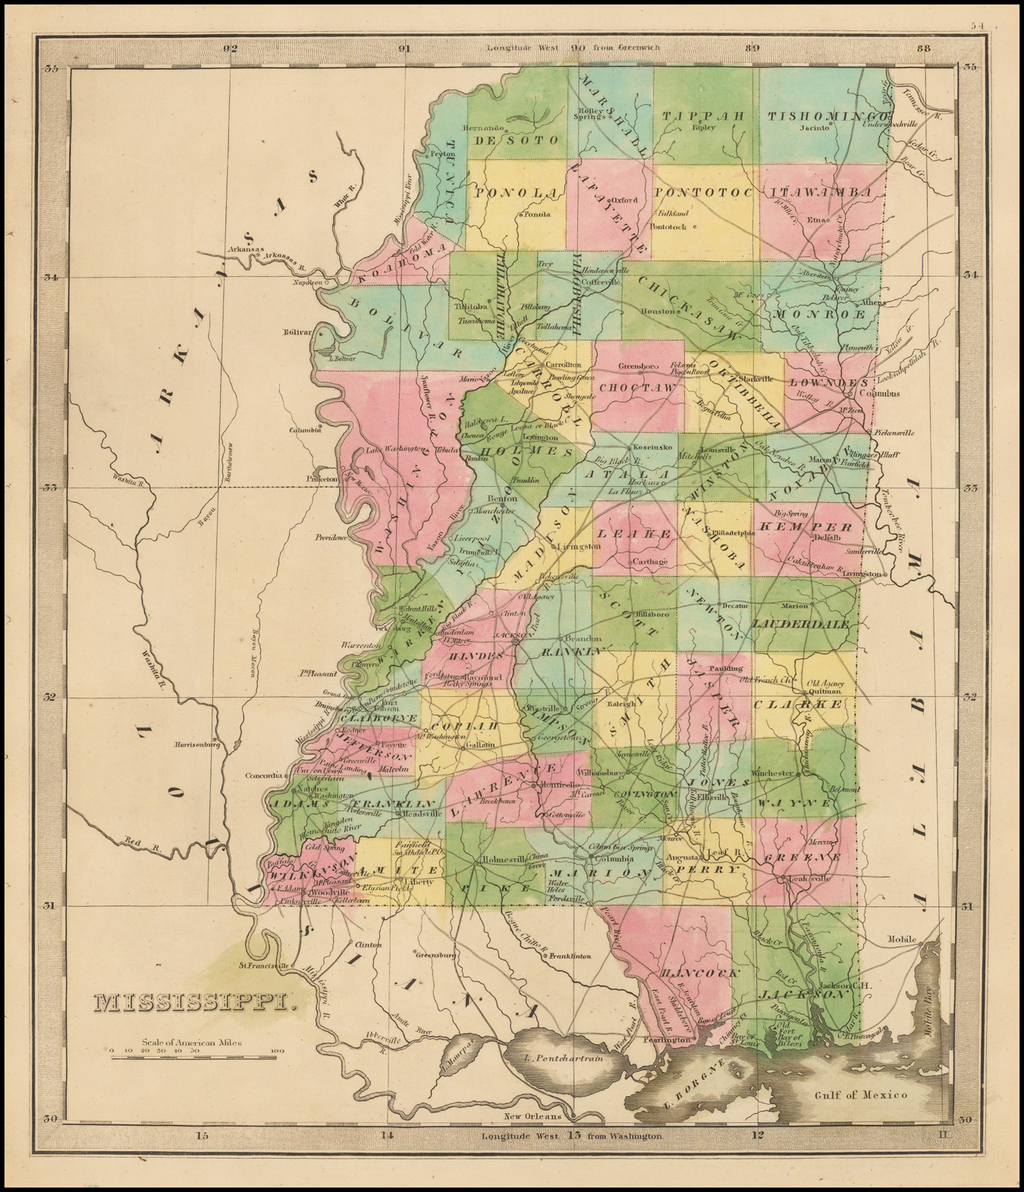 Mississippi By Jeremiah Greenleaf